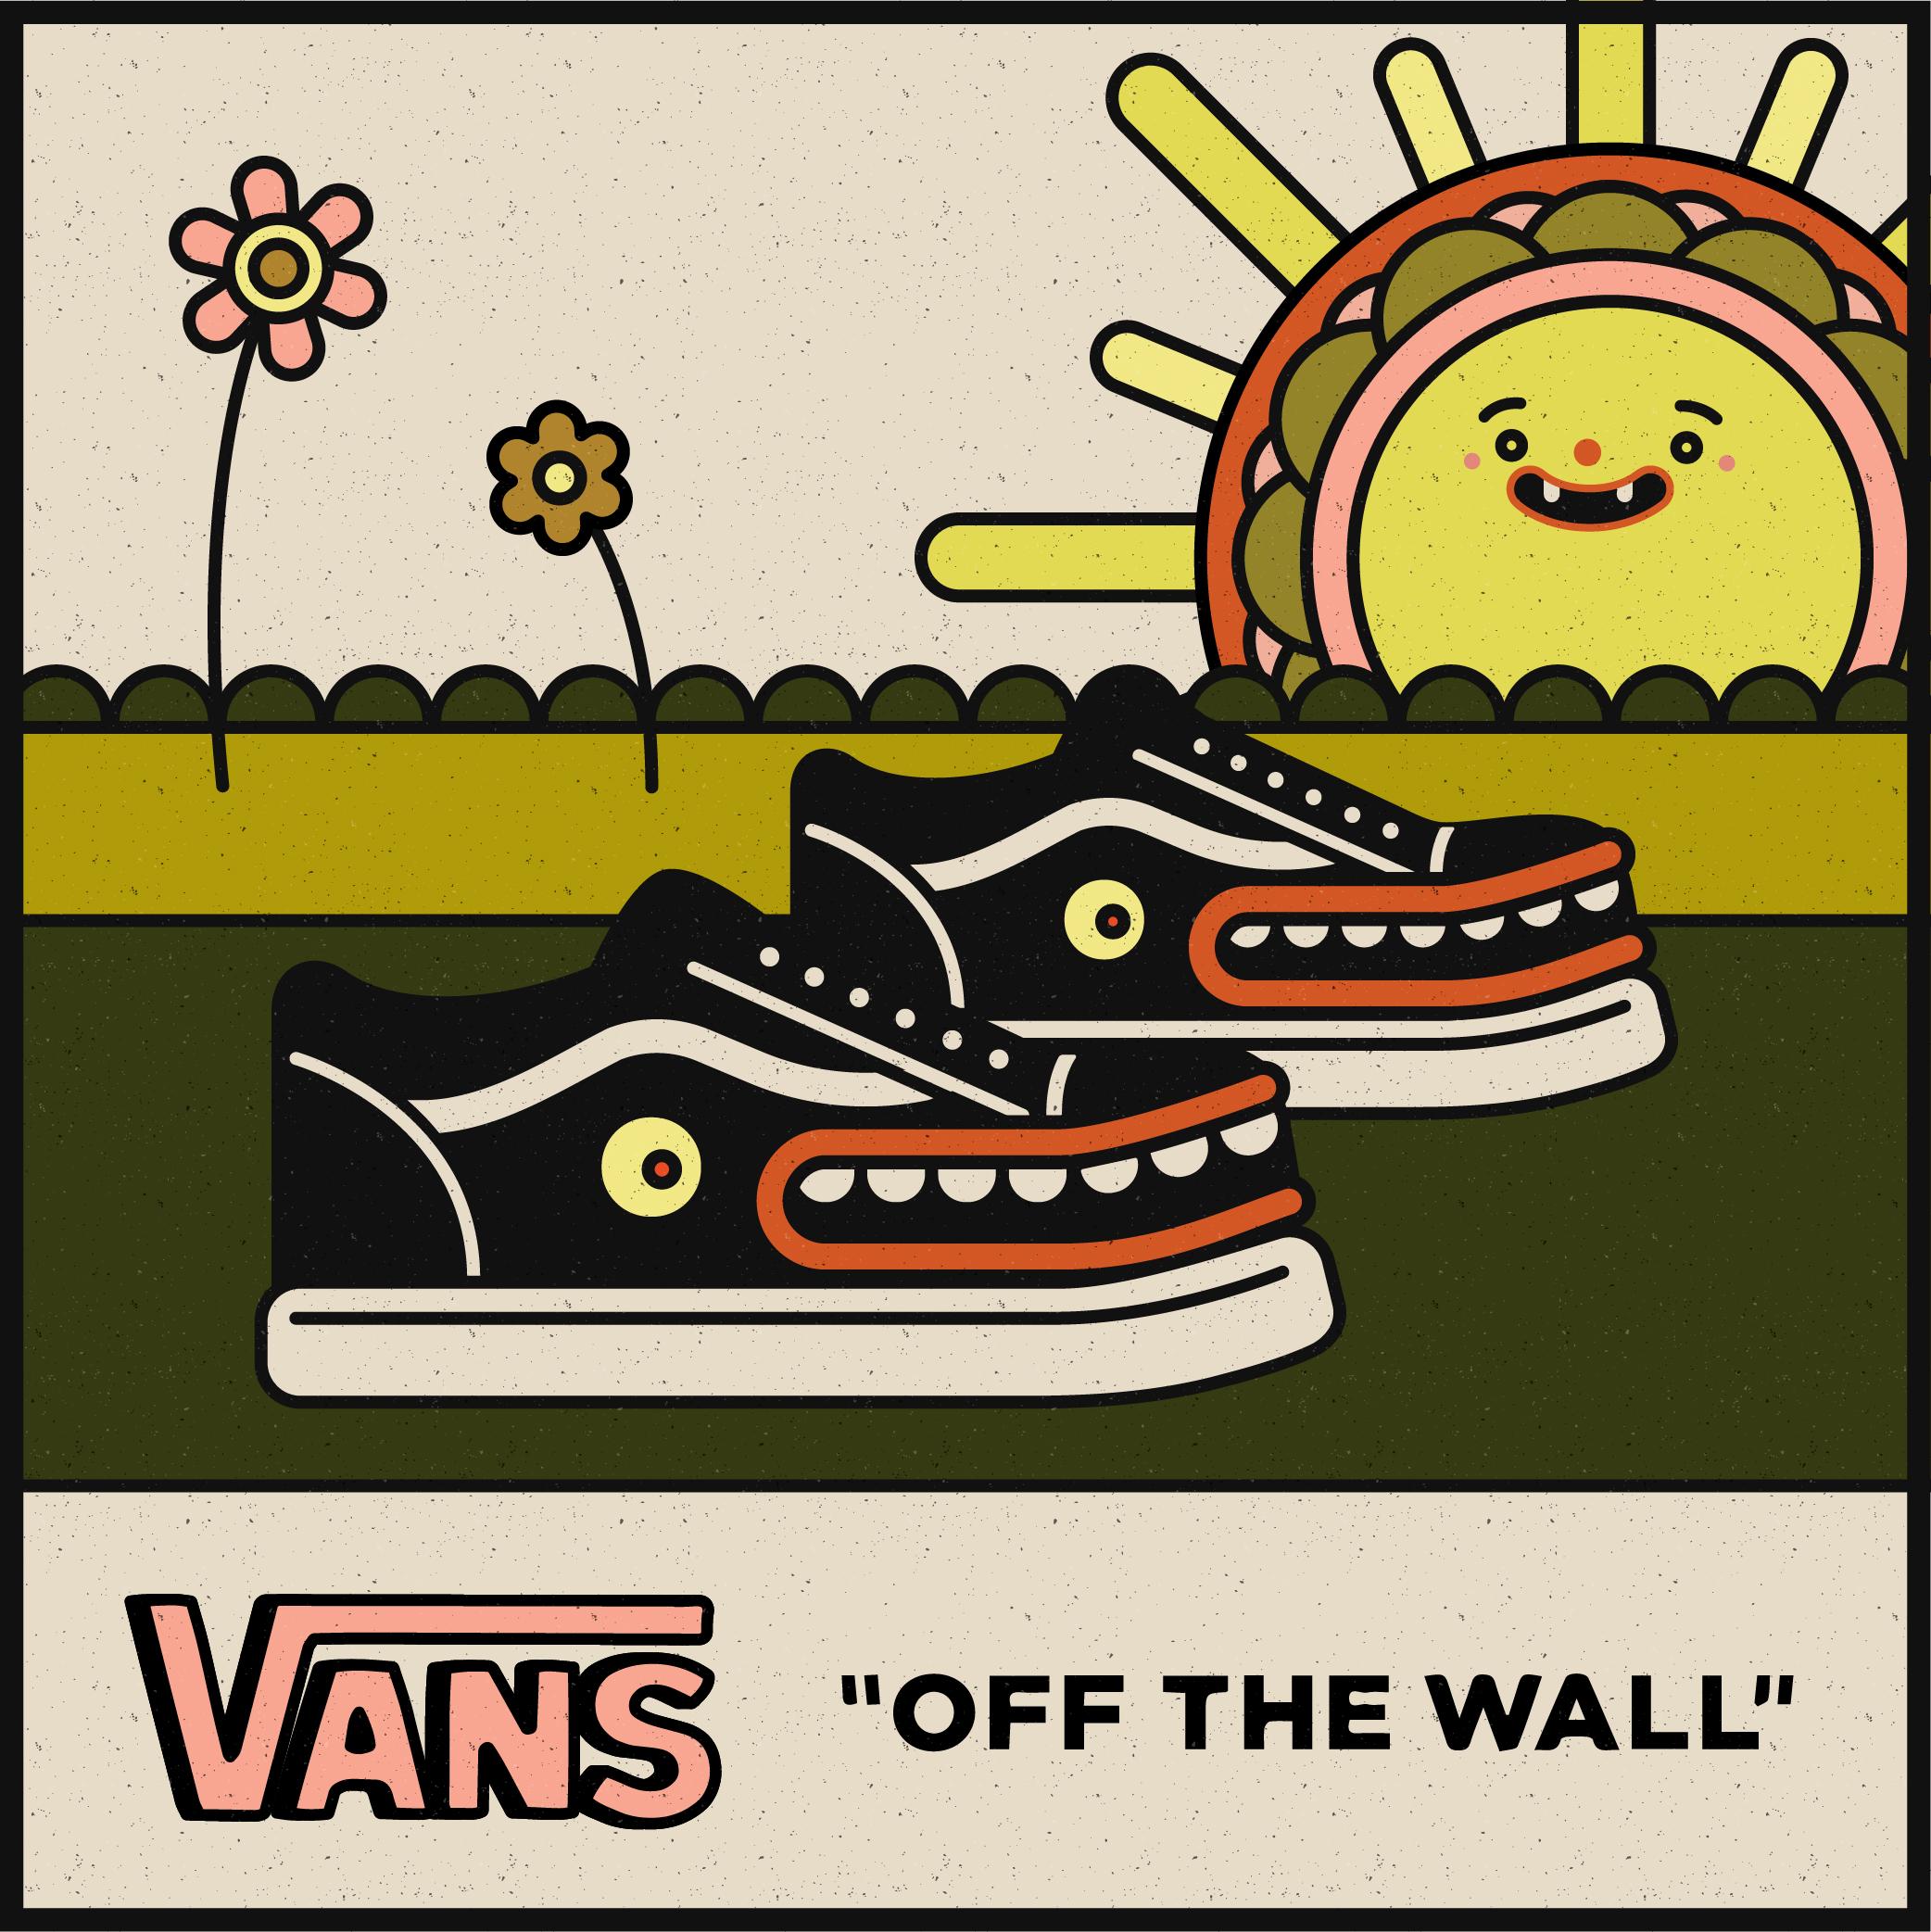 vans_since66_1.1-04.jpg